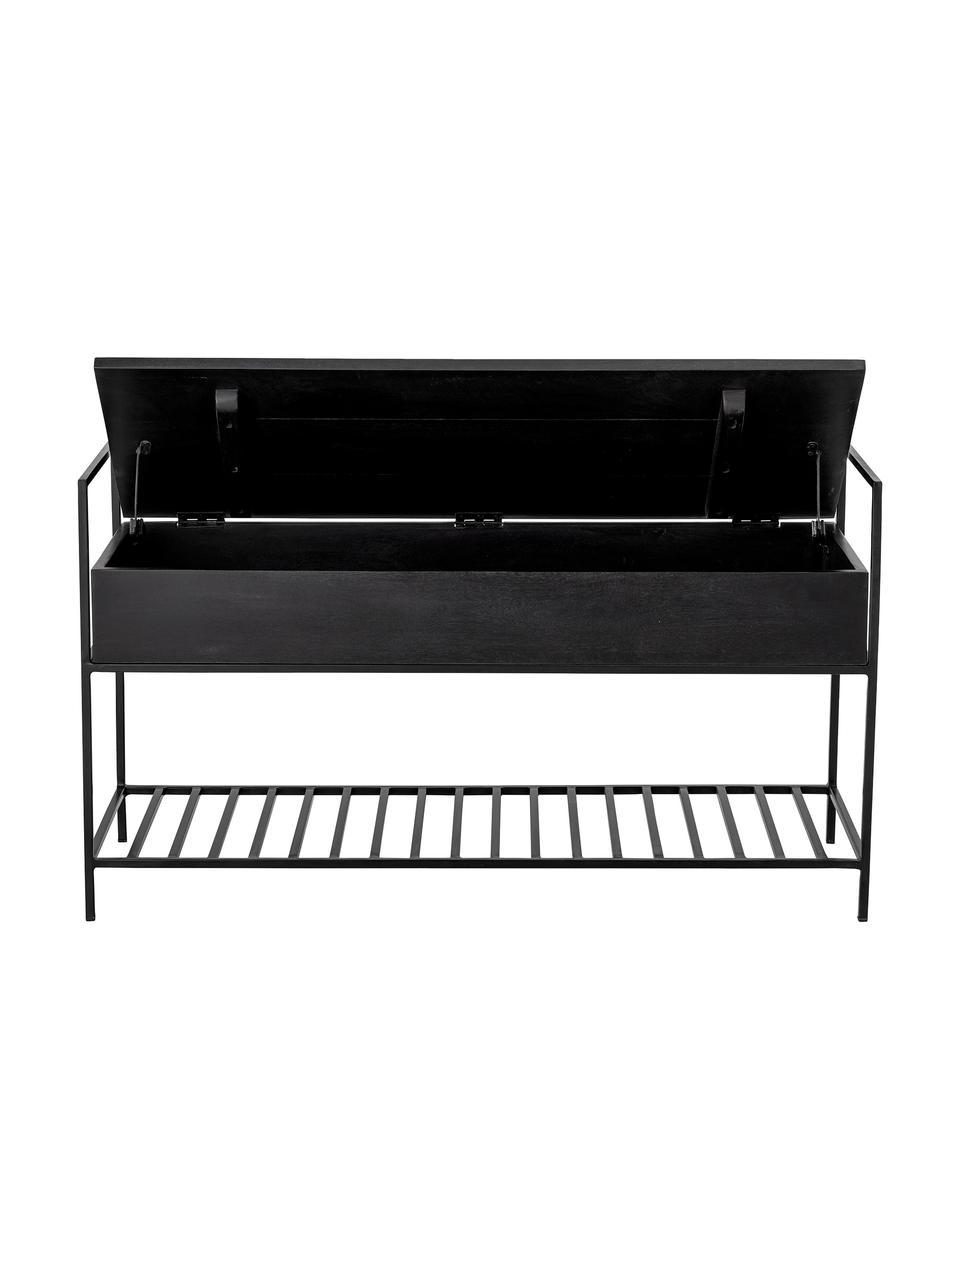 Sitzbank Abelone mit Stauraum, Sitzfläche: Mangoholz, beschichtet, Gestell: Metall, beschichtet, Schwarz, B 102 x T 40 cm